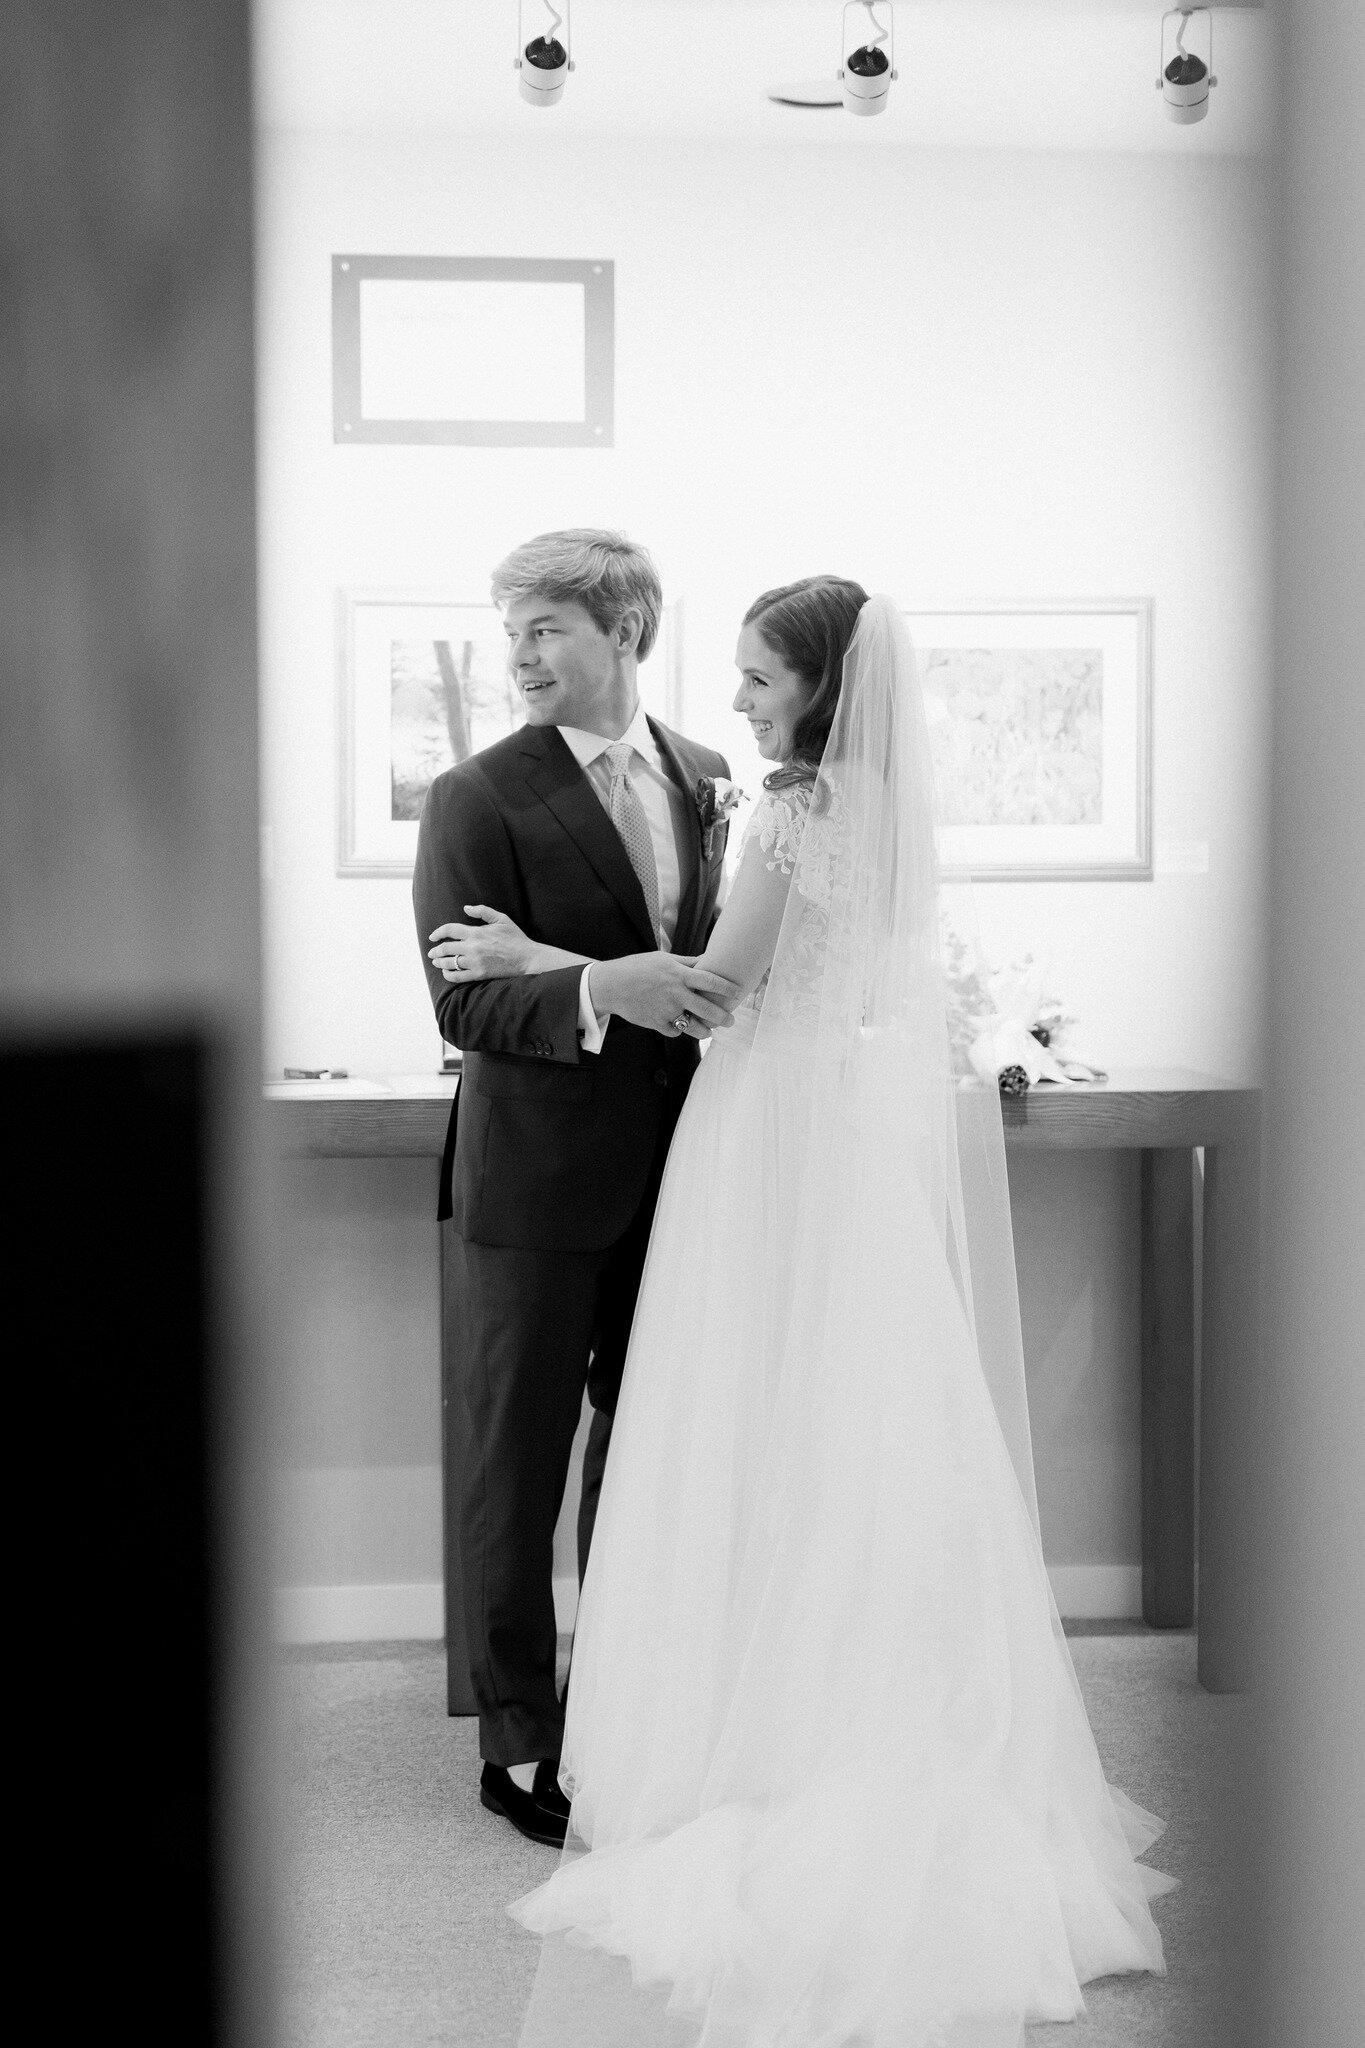 greenwich wedding_belle haven club wedding _ct wedding photographer-27_Easy-Resize.com.jpg